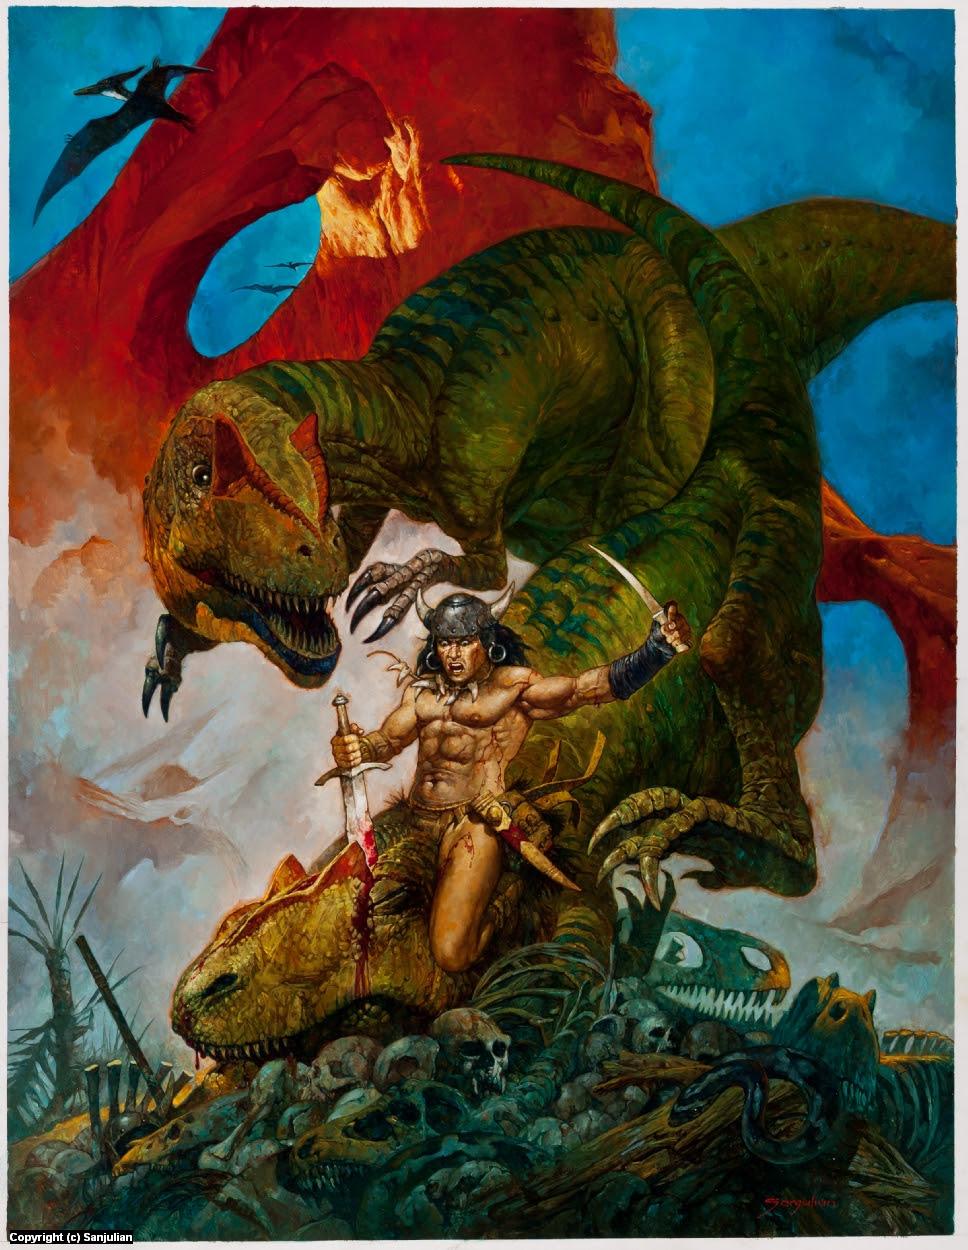 Extinction  - Conan vs. Allosaurus Artwork by Manuel Sanjulian